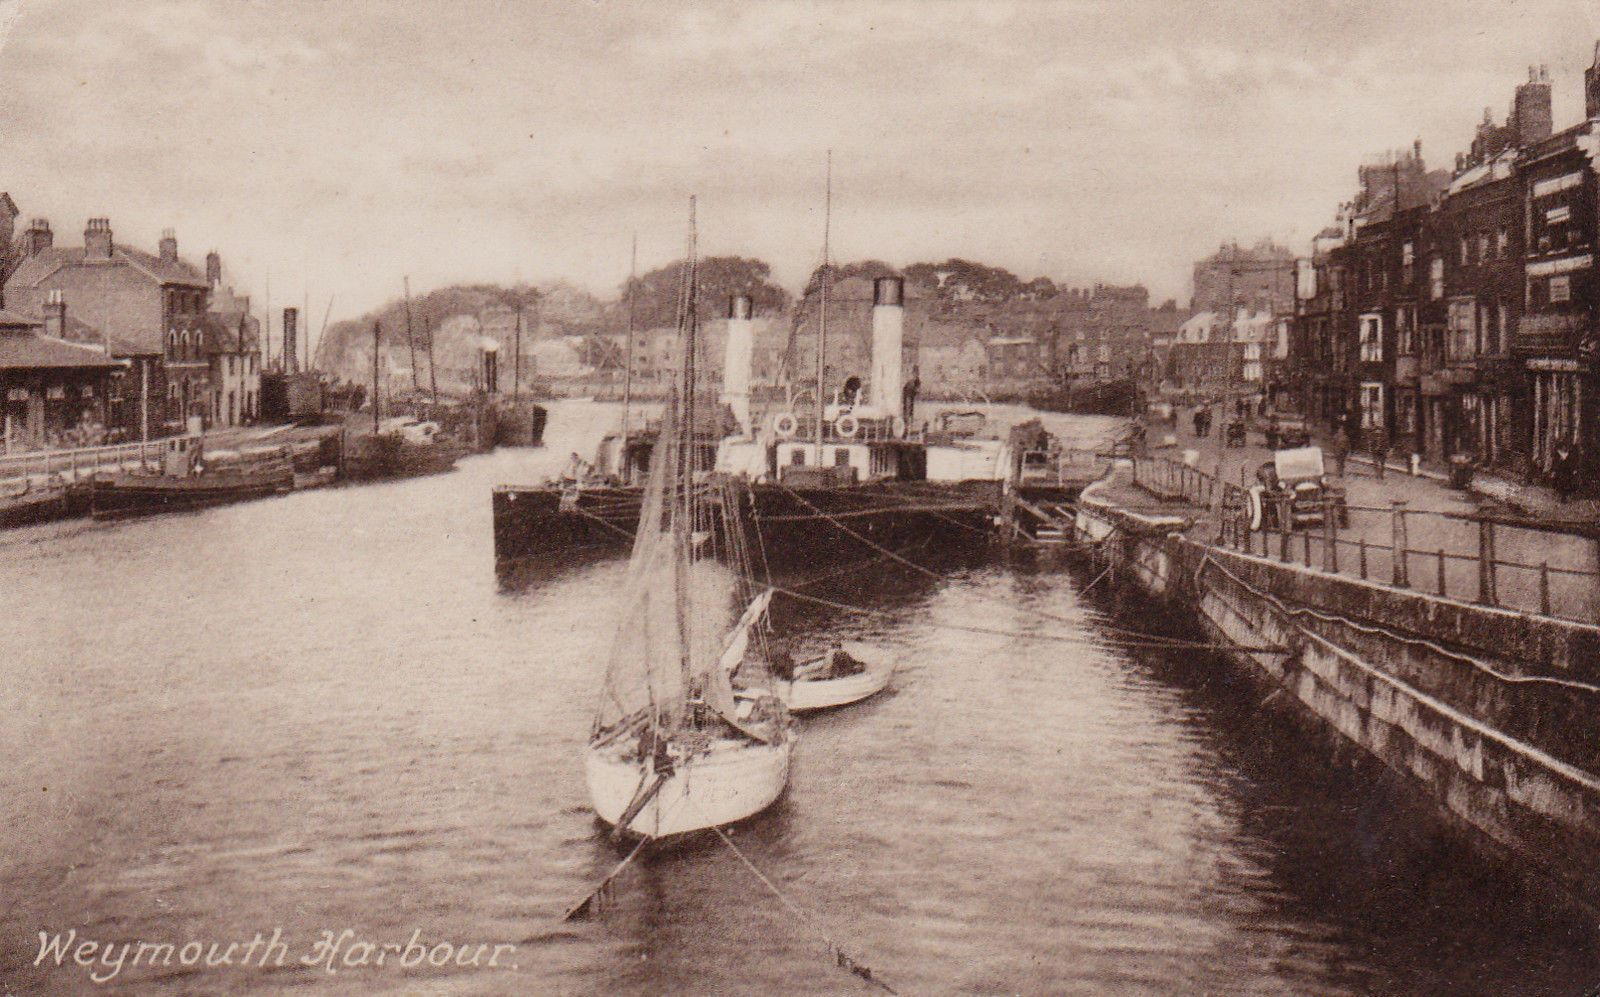 http://picclick.ie/Weymouth-Harbour-Dorset-Postcard-1922 ...